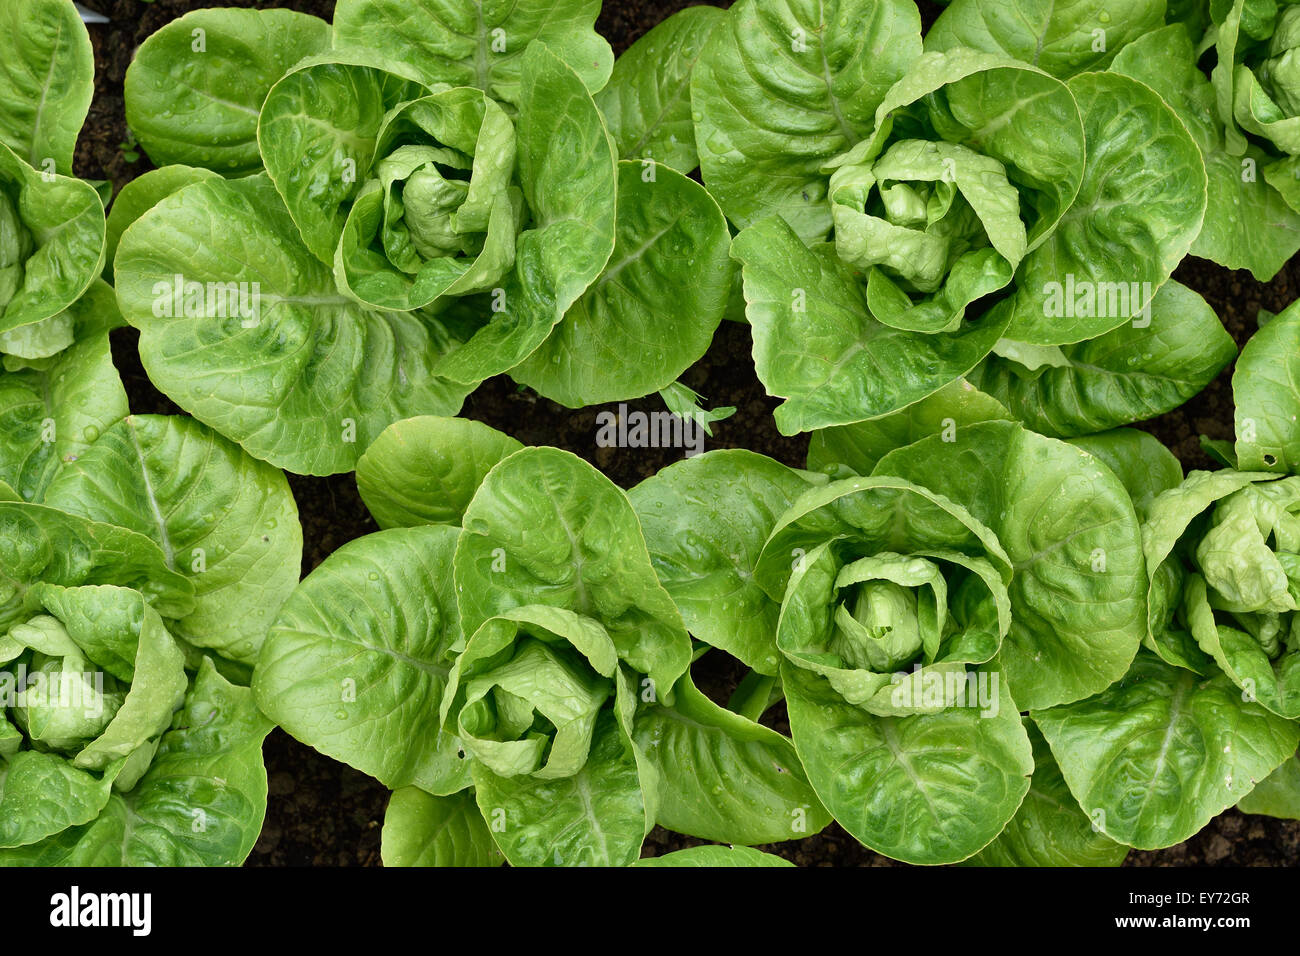 Little Gem Romaine Lettuce in a garden. Top view. Small lettuces growing in a row in a garden. Organic gardening. - Stock Image